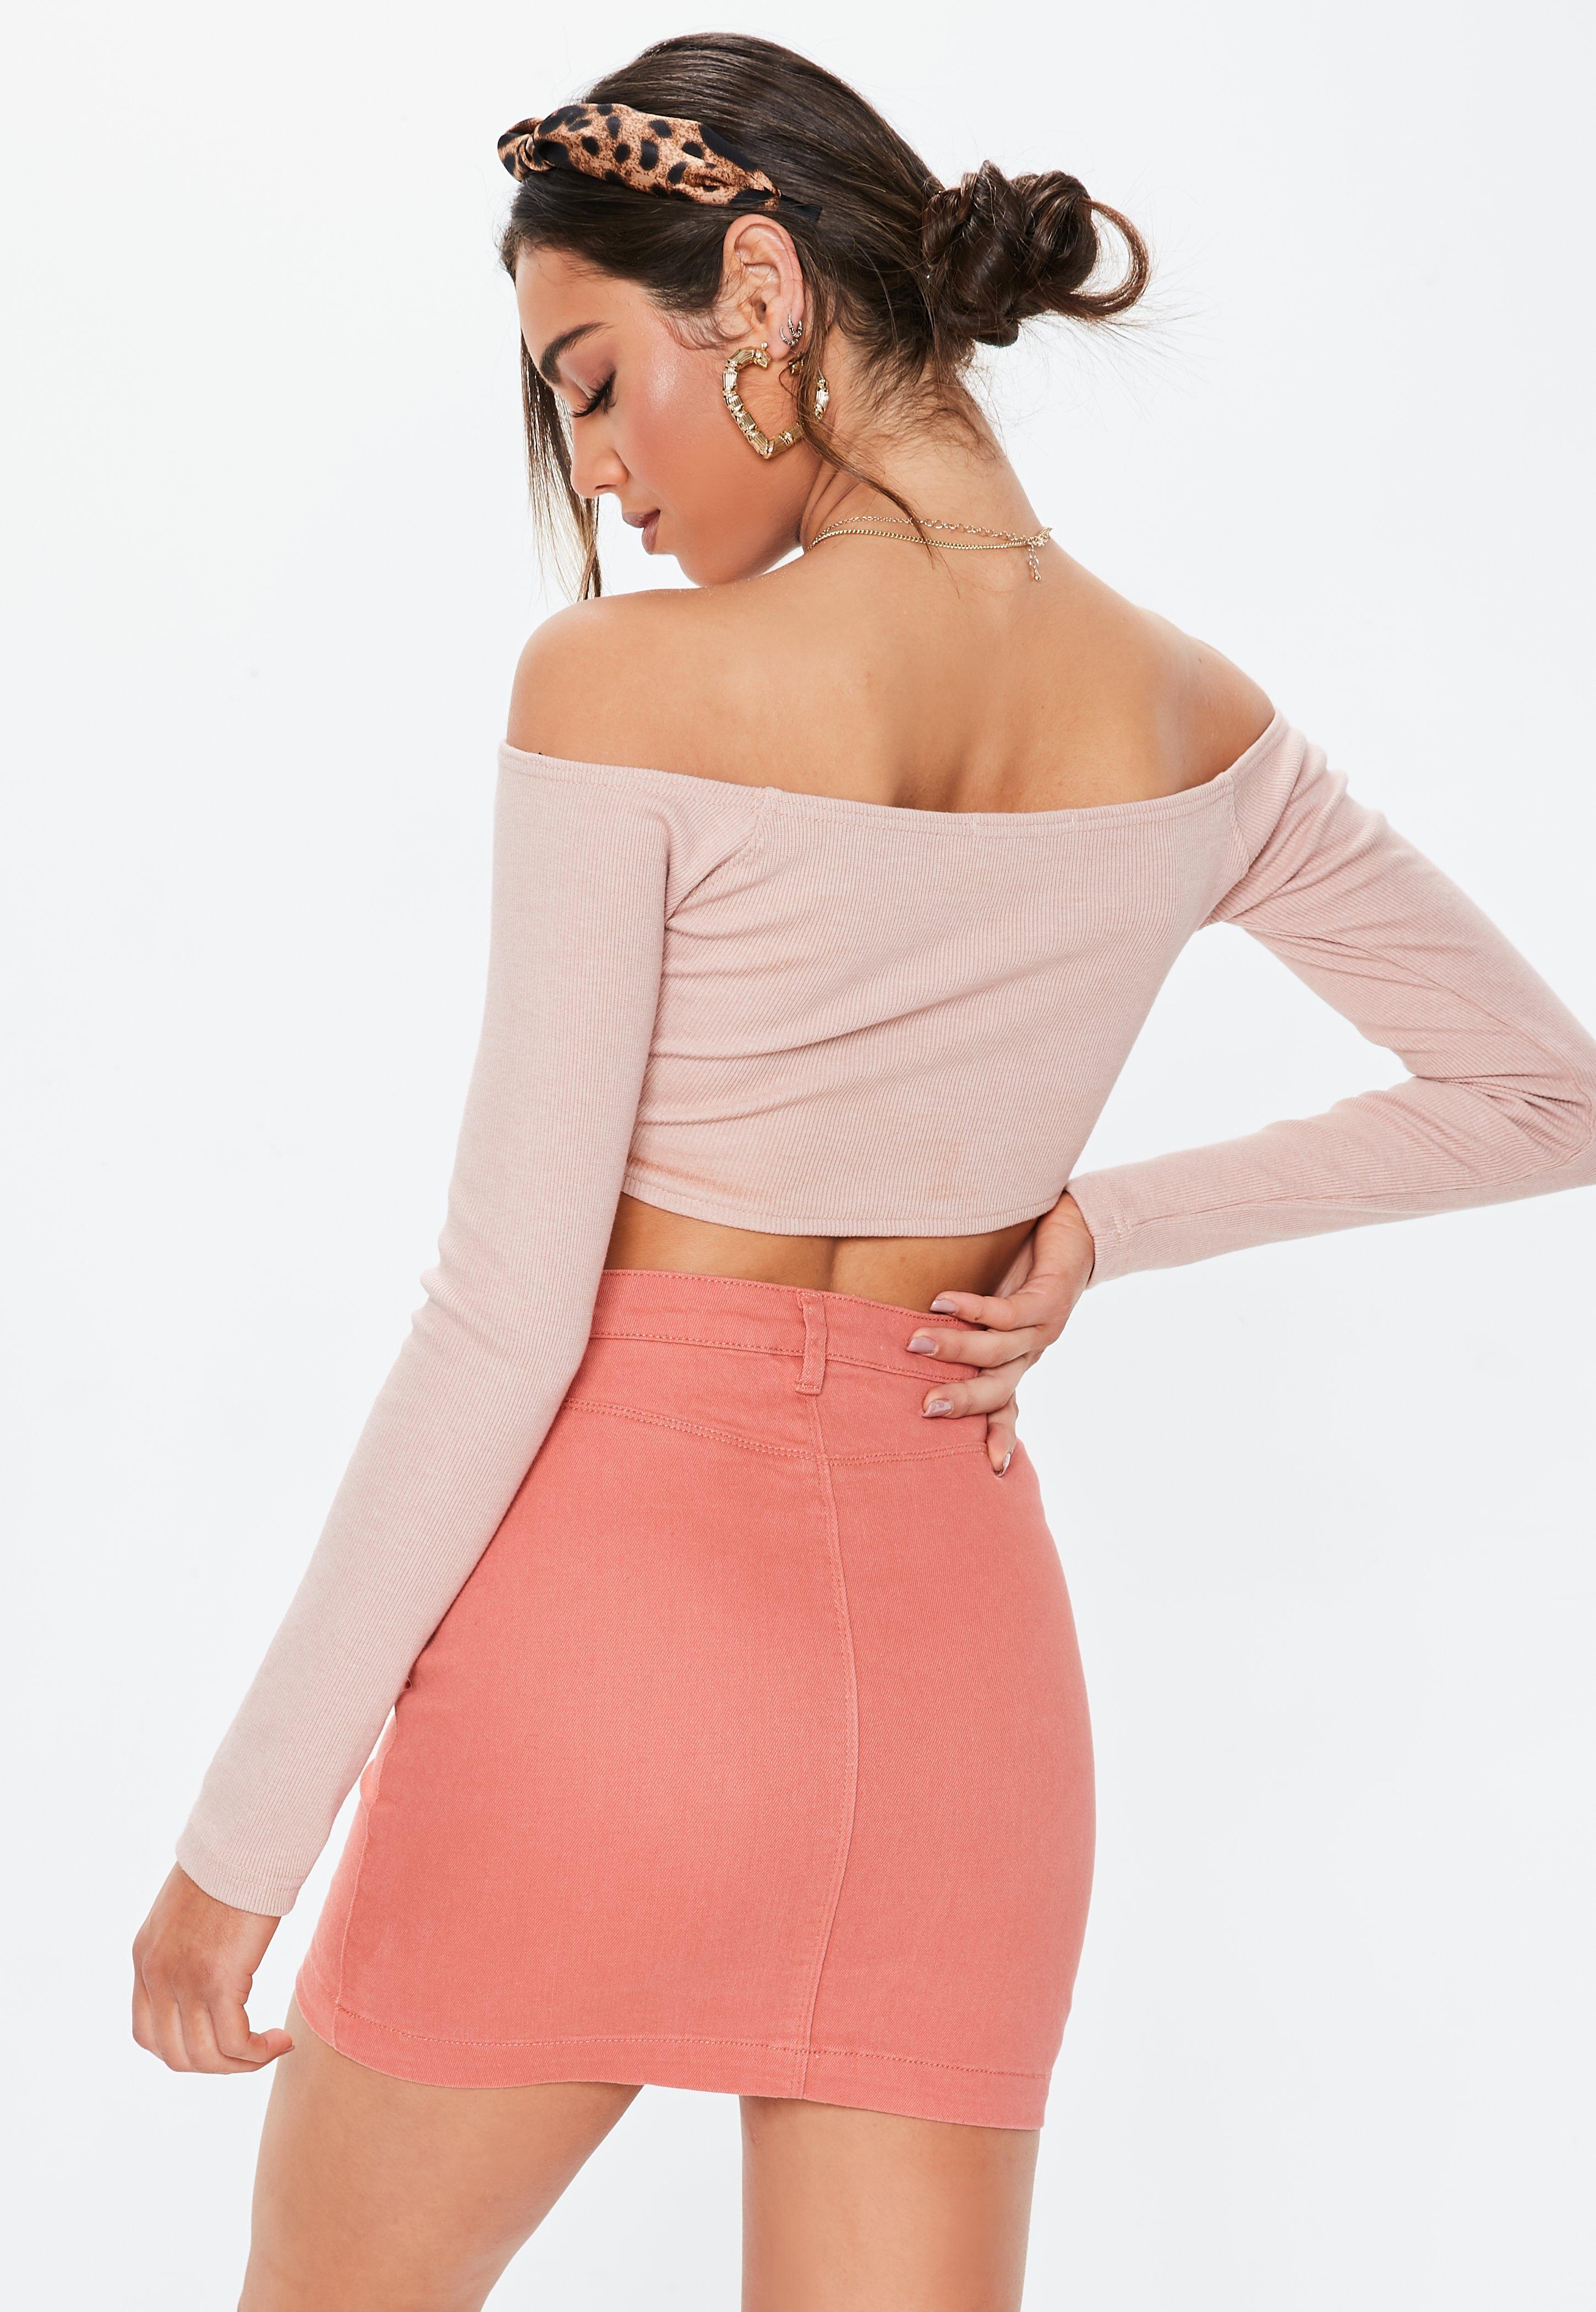 d888d5b578 Missguided - Pink Coral Denim Superstretch Mini Skirt - Lyst. View  fullscreen